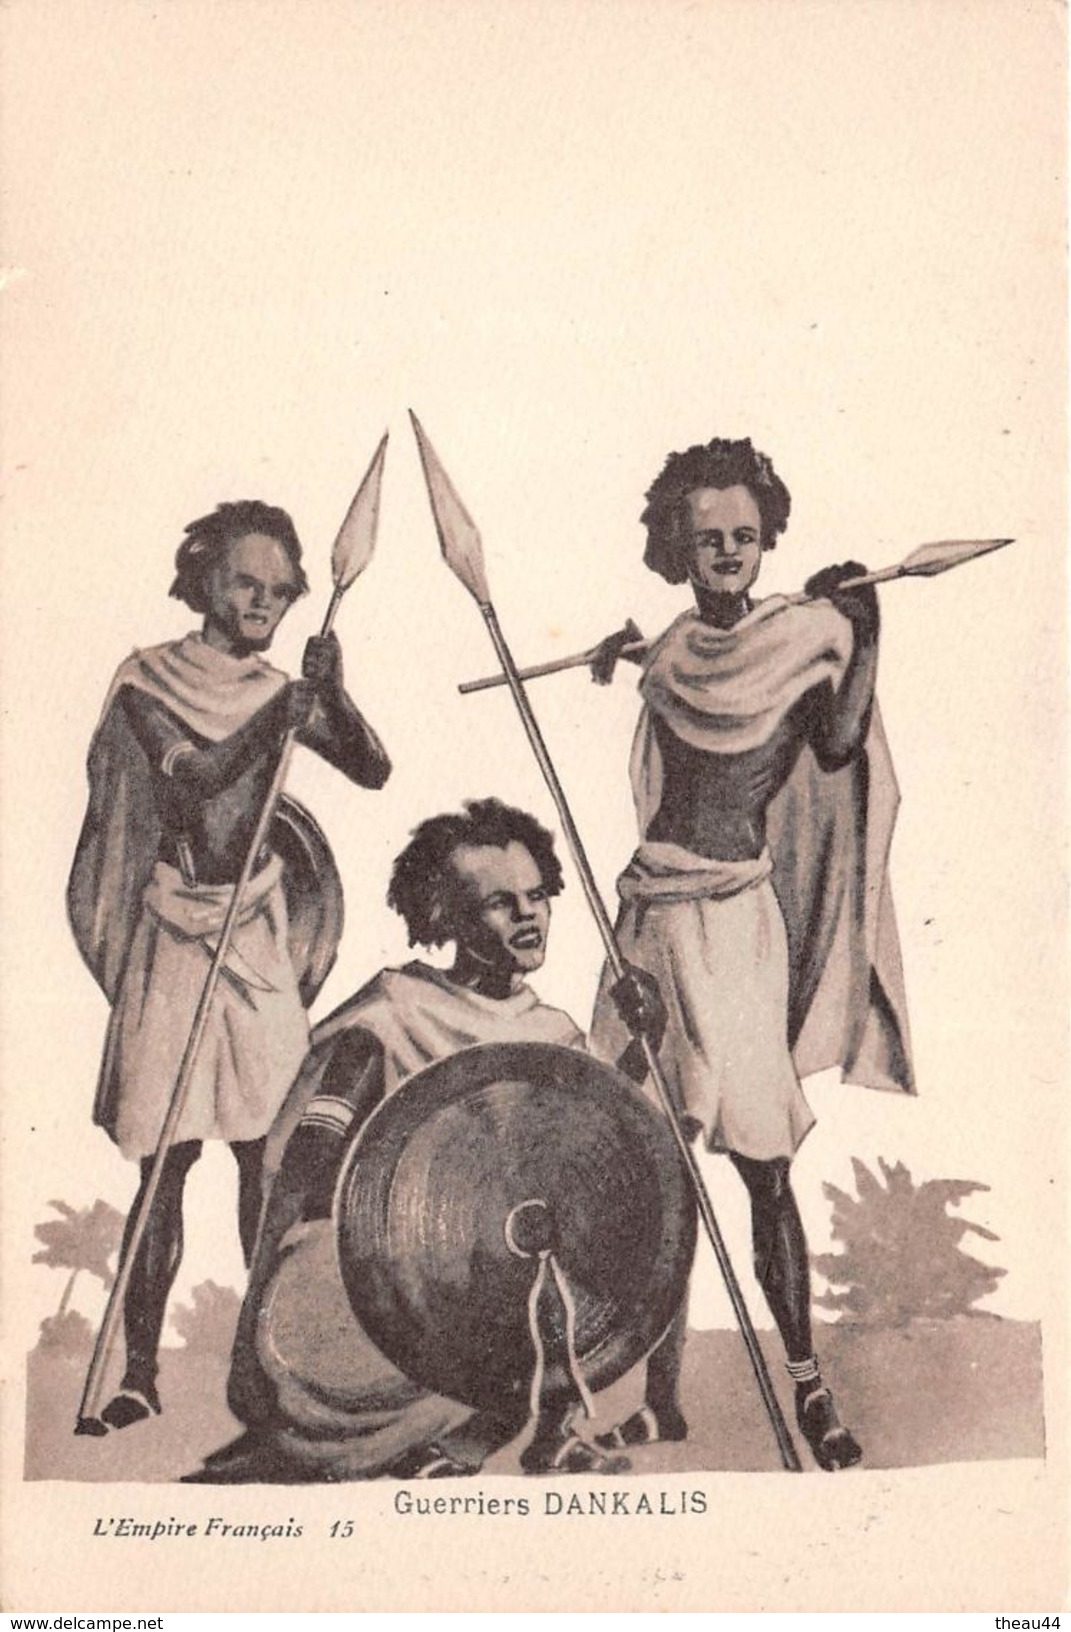 ¤¤   -  SOMALIE  -  Guerriers DANKALIS   - Dessin , Illustrateur   -  ¤¤ - Somalie